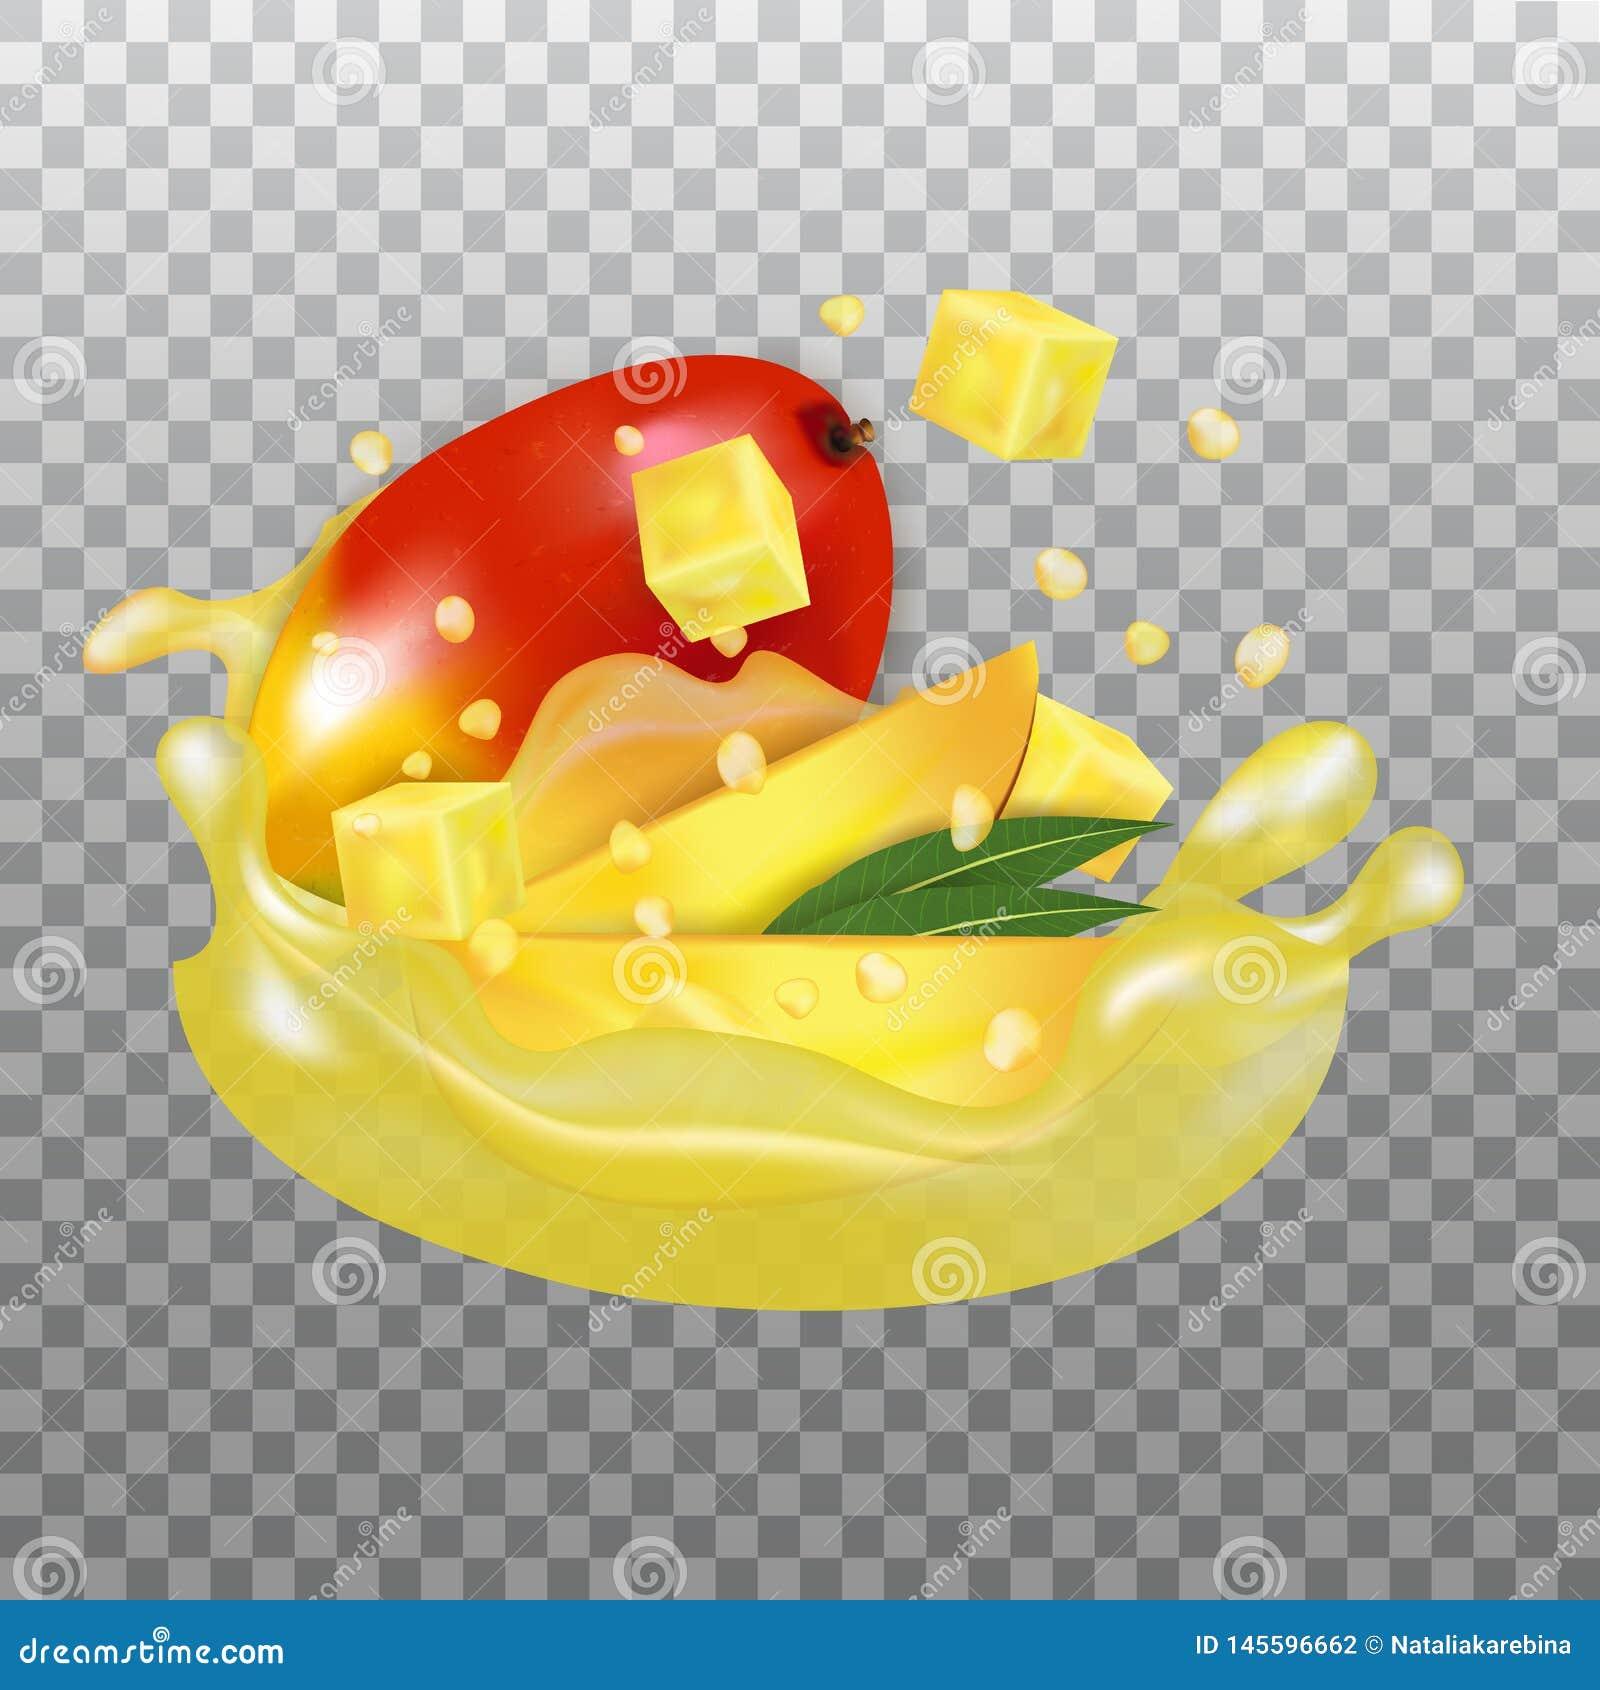 Verse Mango en sapplons Fruit 3d realistische vector op transparante achtergrond